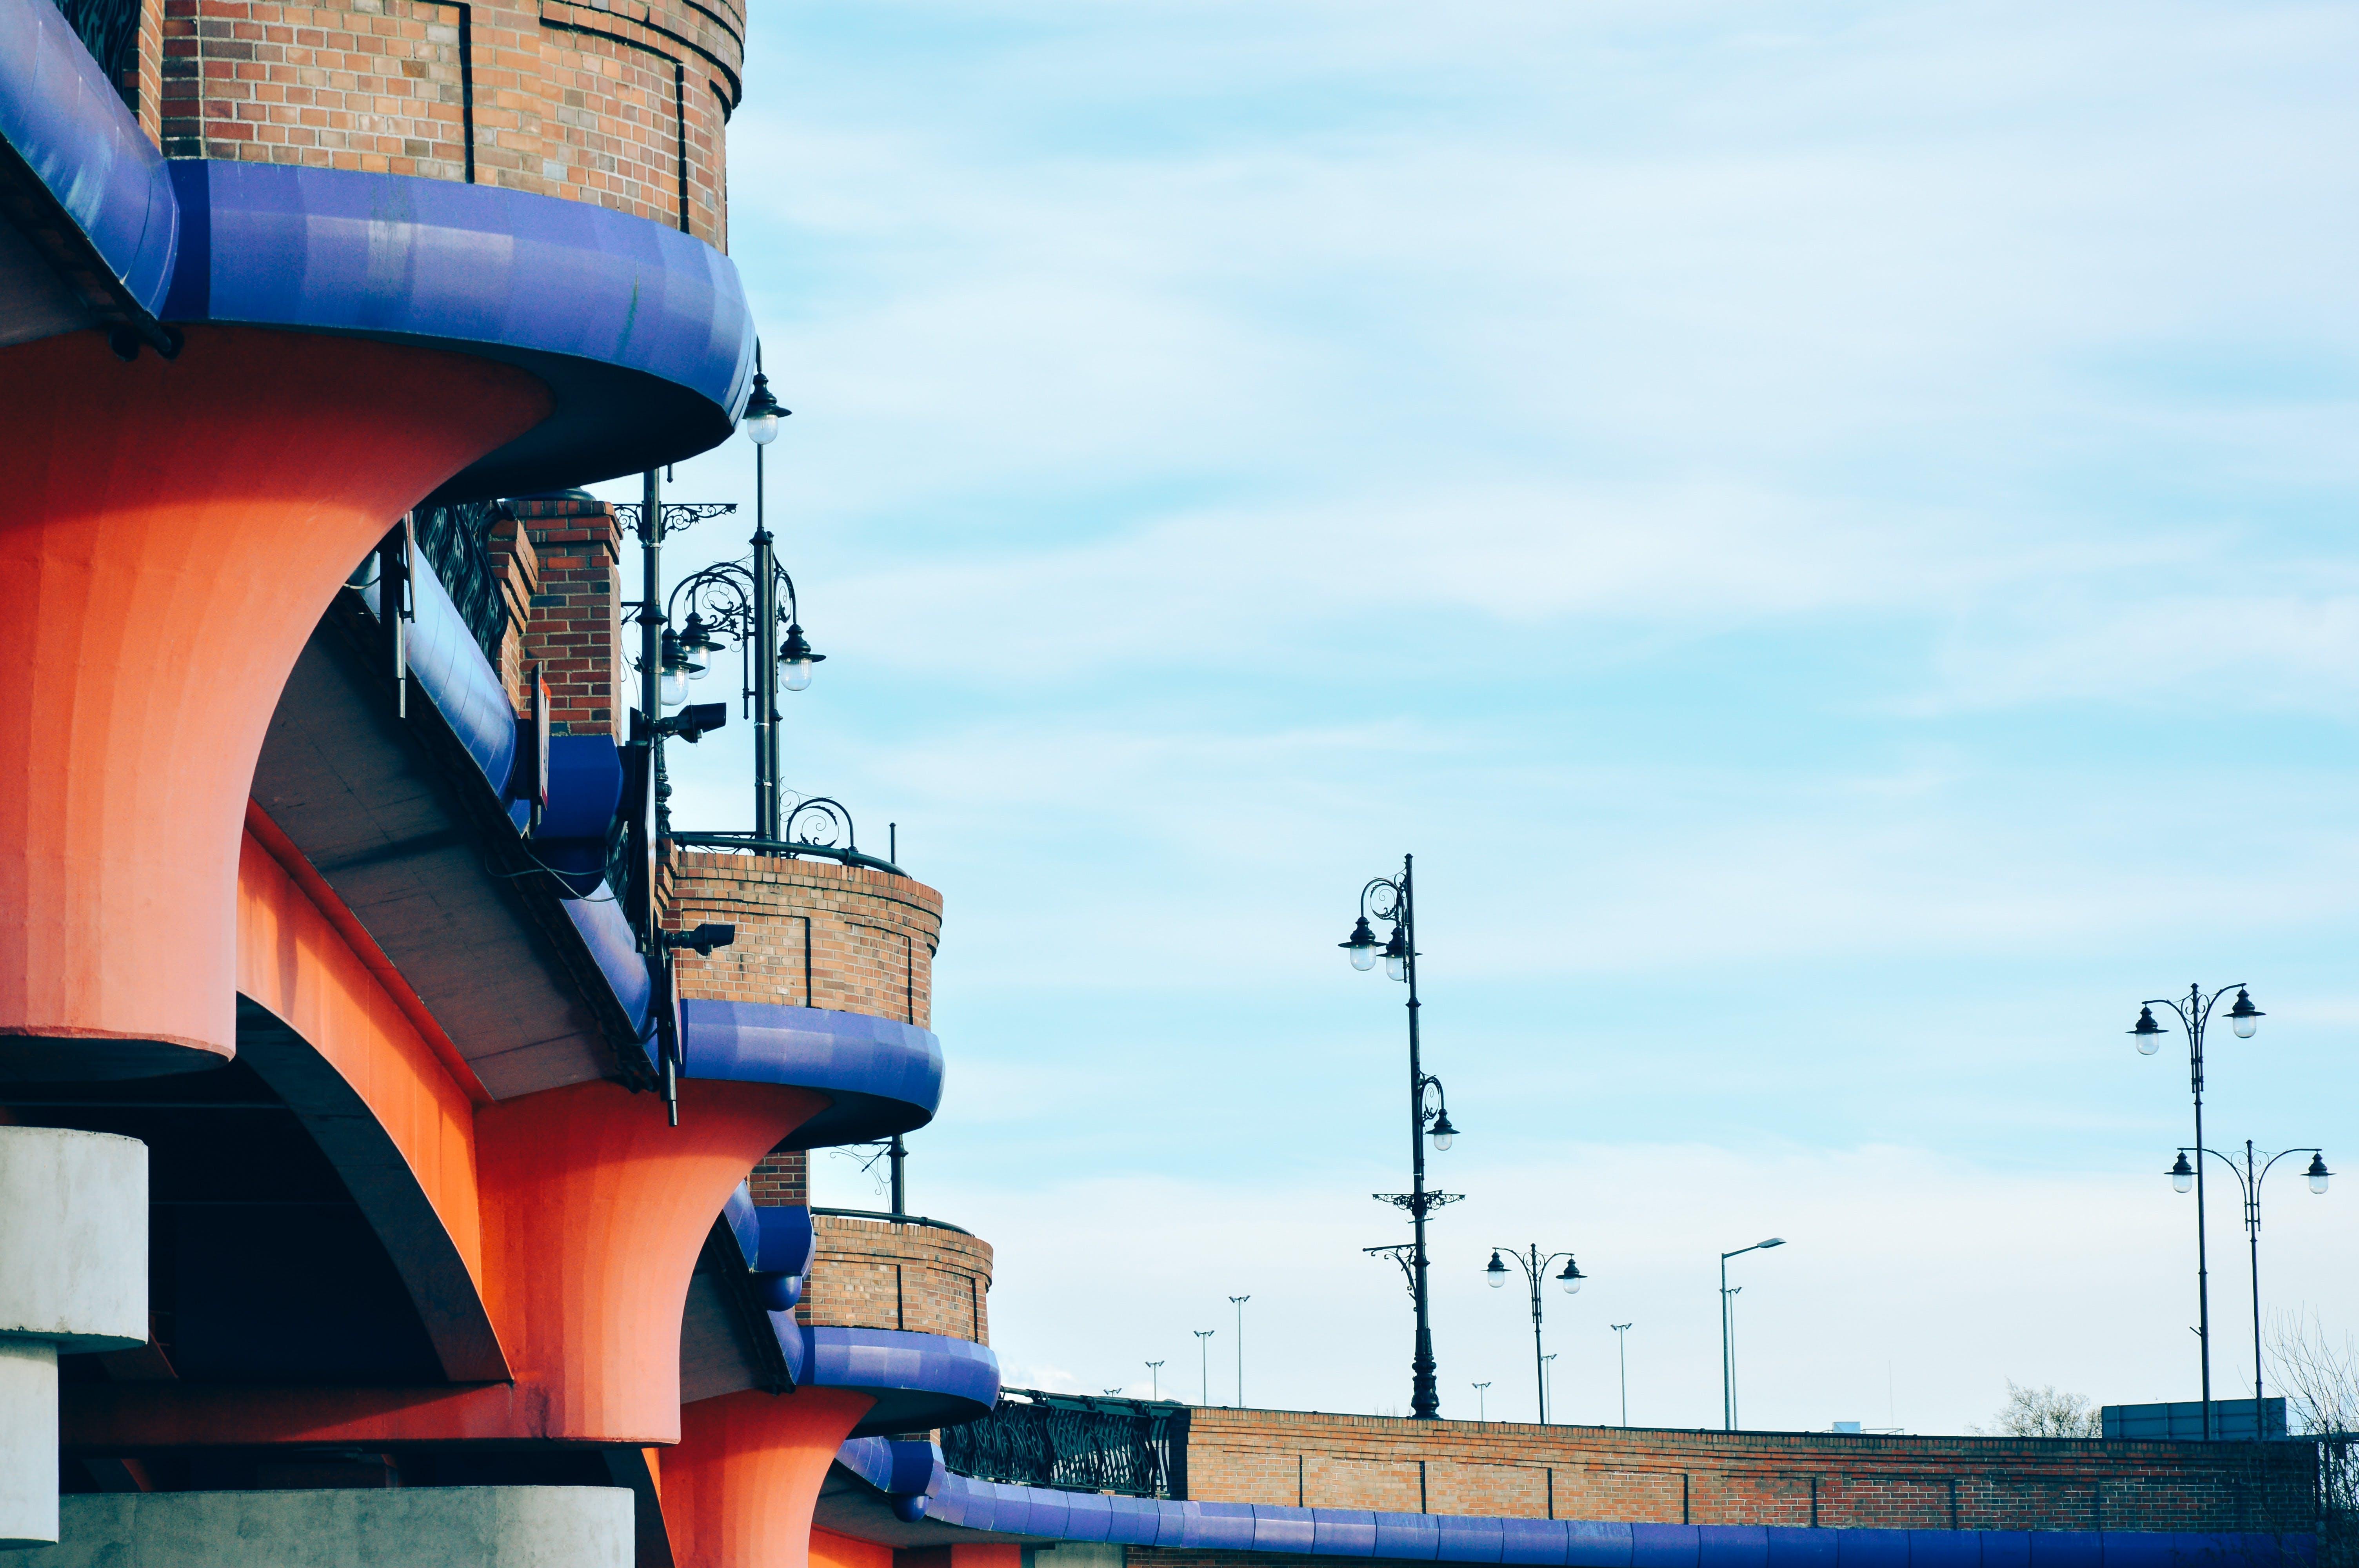 Free stock photo of bridge, architecture, street lamps, perspective